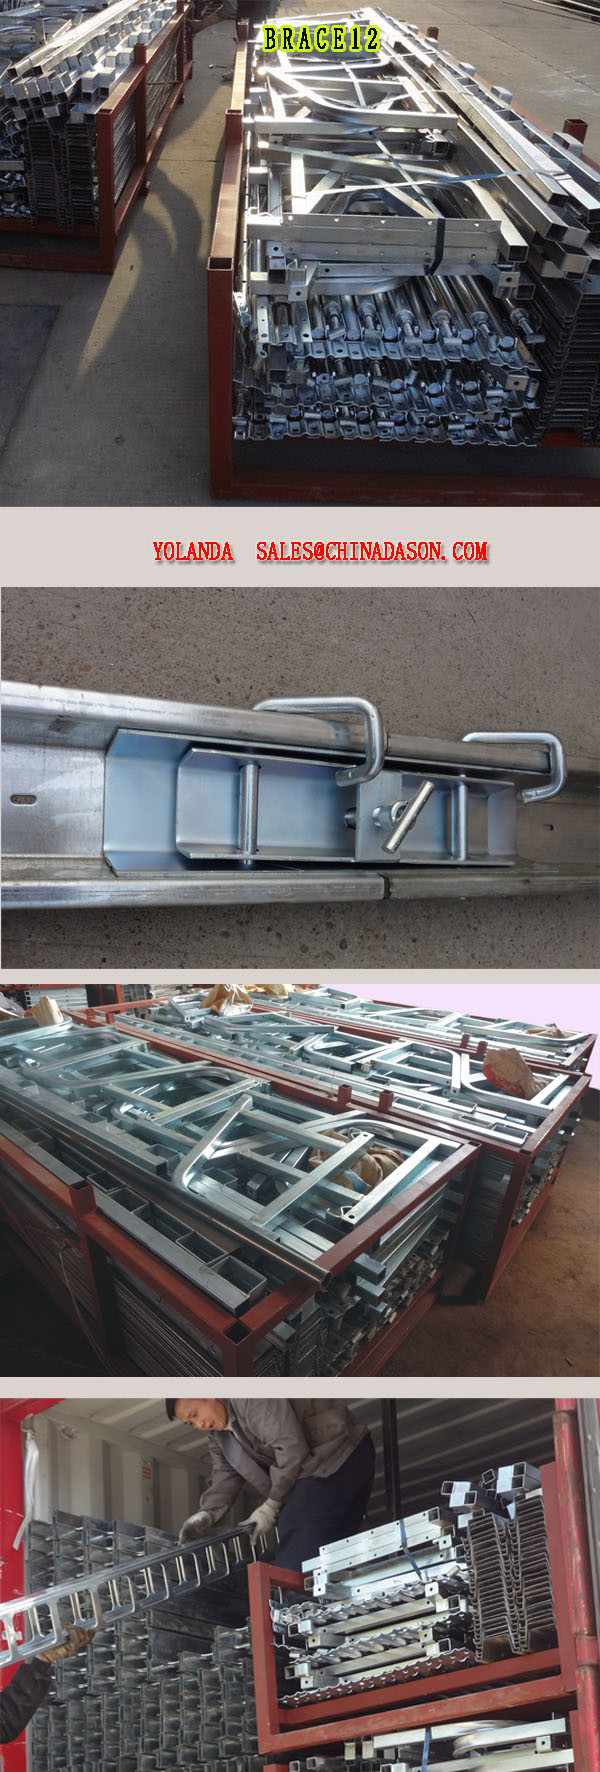 Steel Icf Bracing Brace12